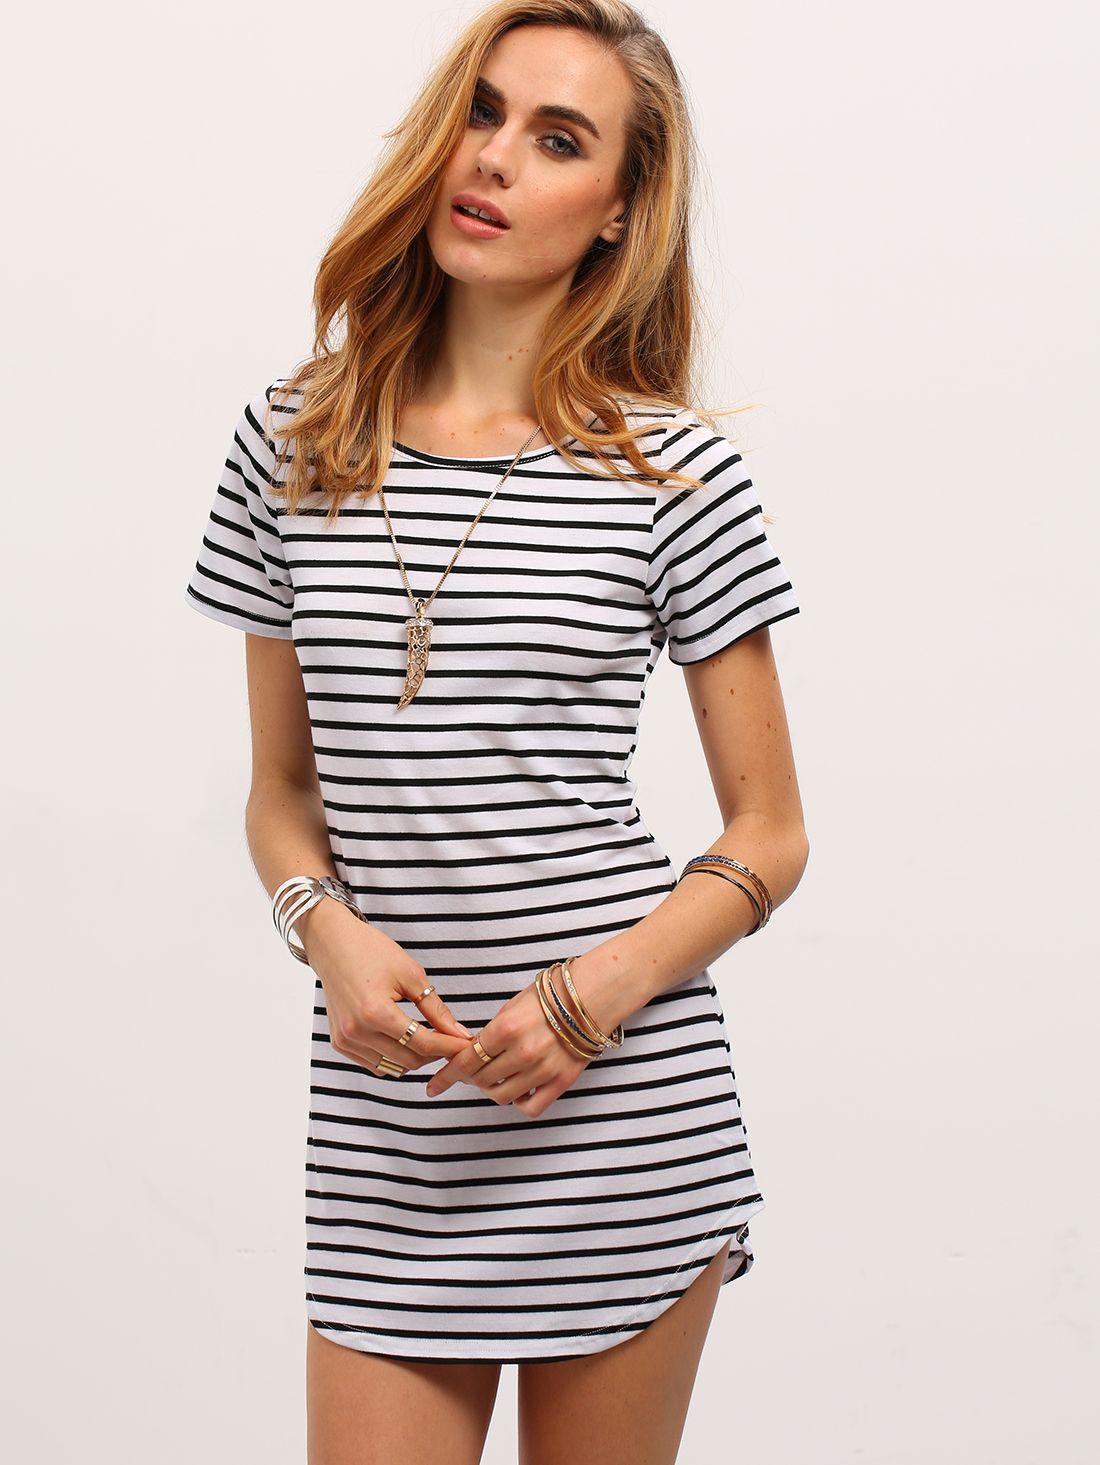 891b6b964a Shop Black White V Neck Striped Slim Dress online. SheIn offers Black White  V Neck Striped Slim Dress   more to fit your fashionable needs.